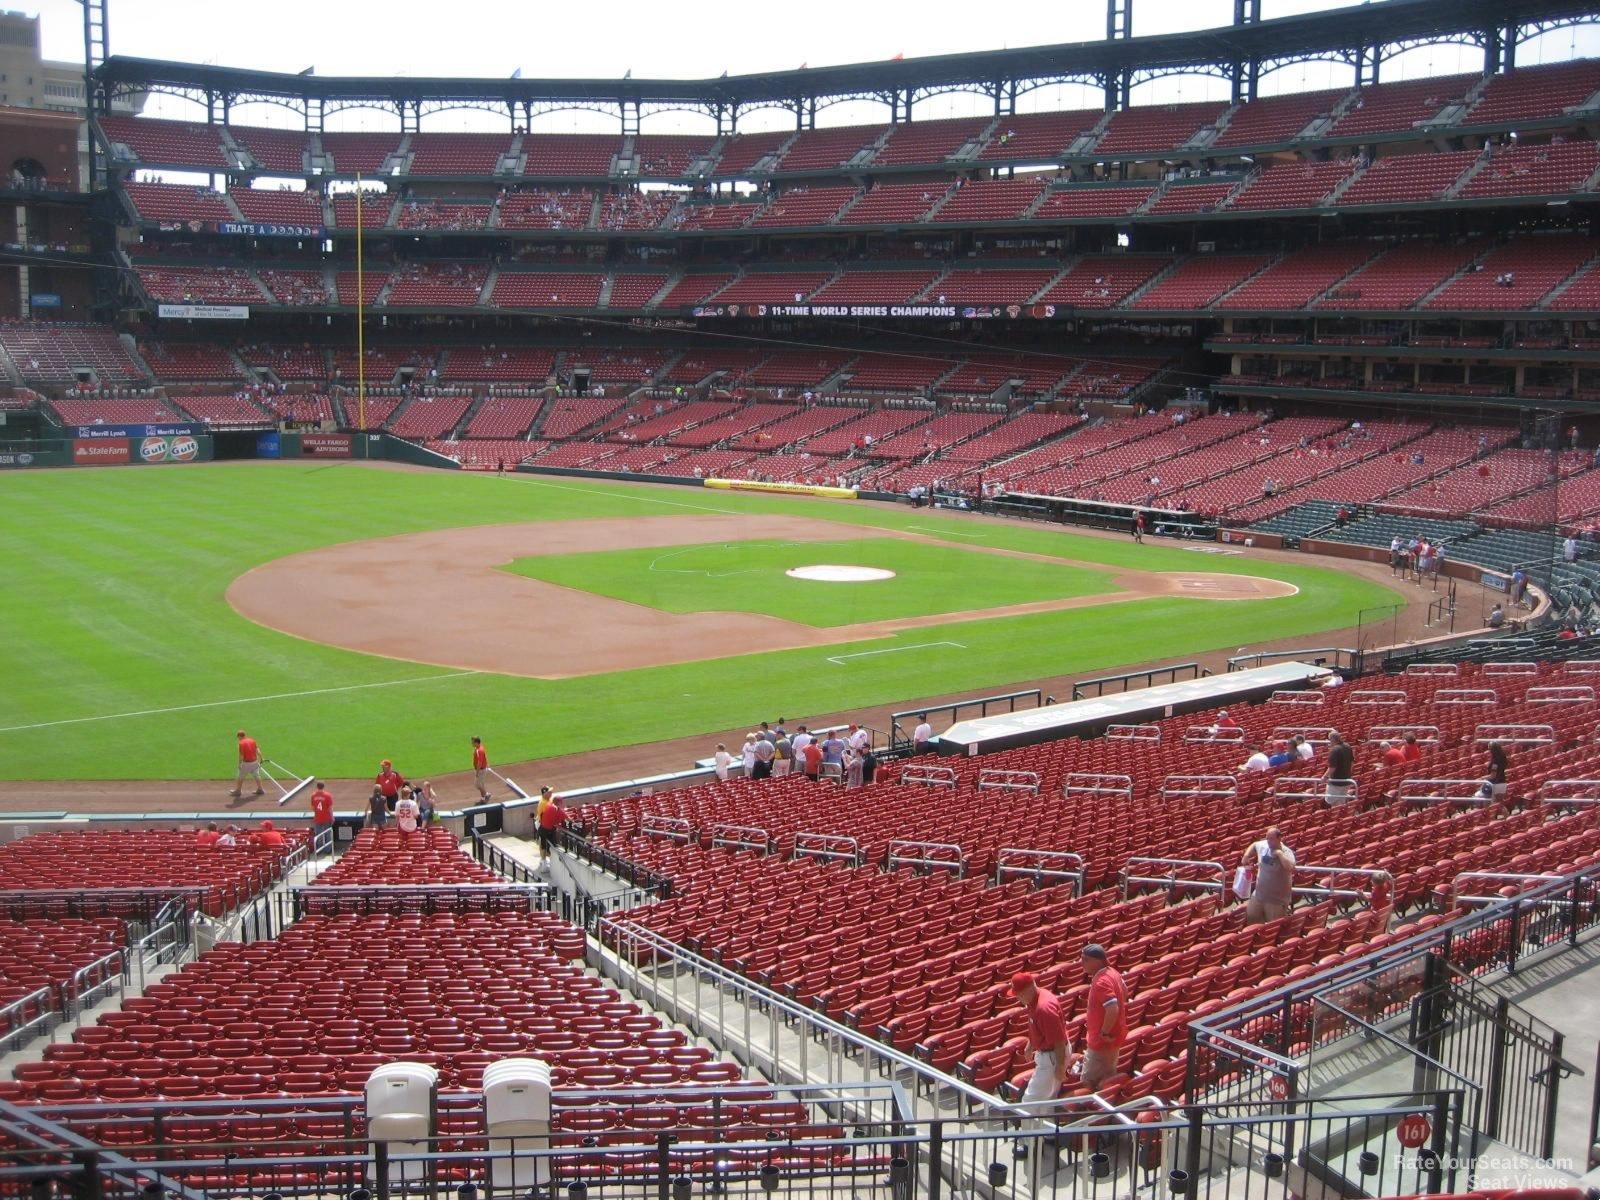 Busch Stadium Section 161 - RateYourSeats.com